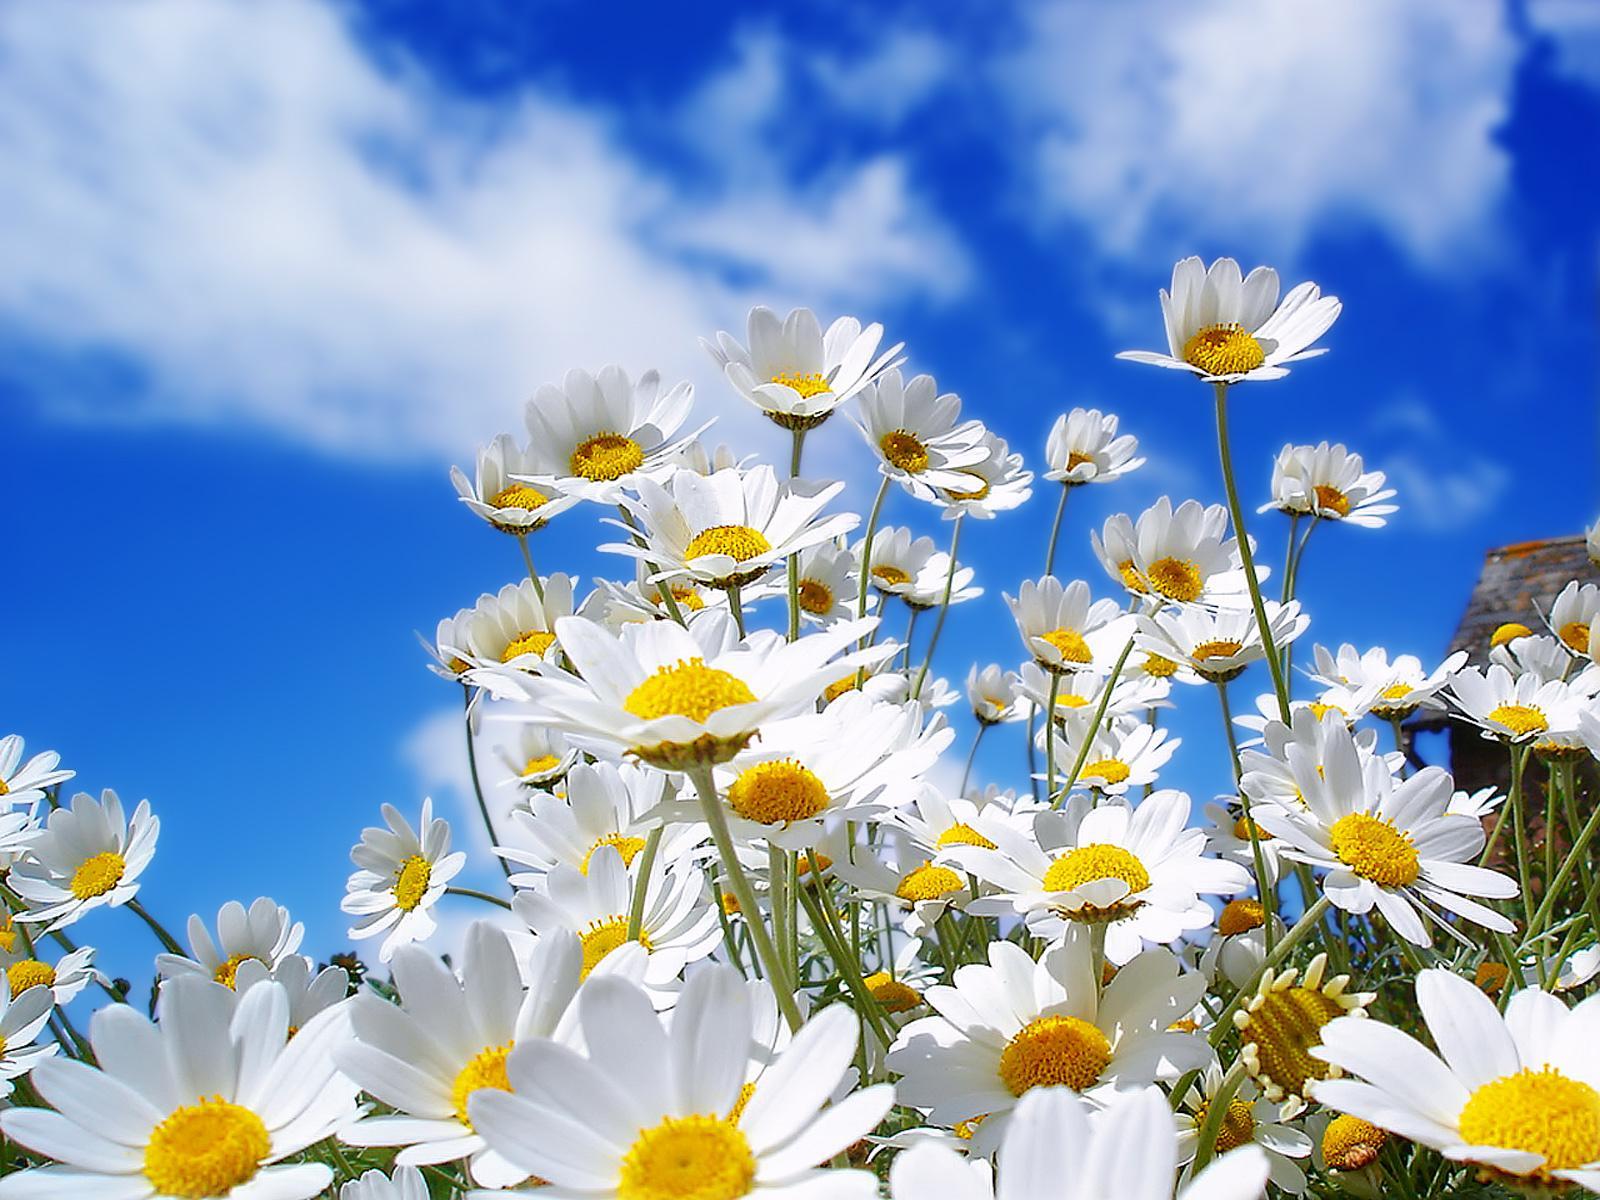 http://4.bp.blogspot.com/_hEeDlsg8wA4/TSbdfzEccbI/AAAAAAAABdo/rPV51JTDfPc/s1600/wp_Spring_Daisy_1600x1200.jpg